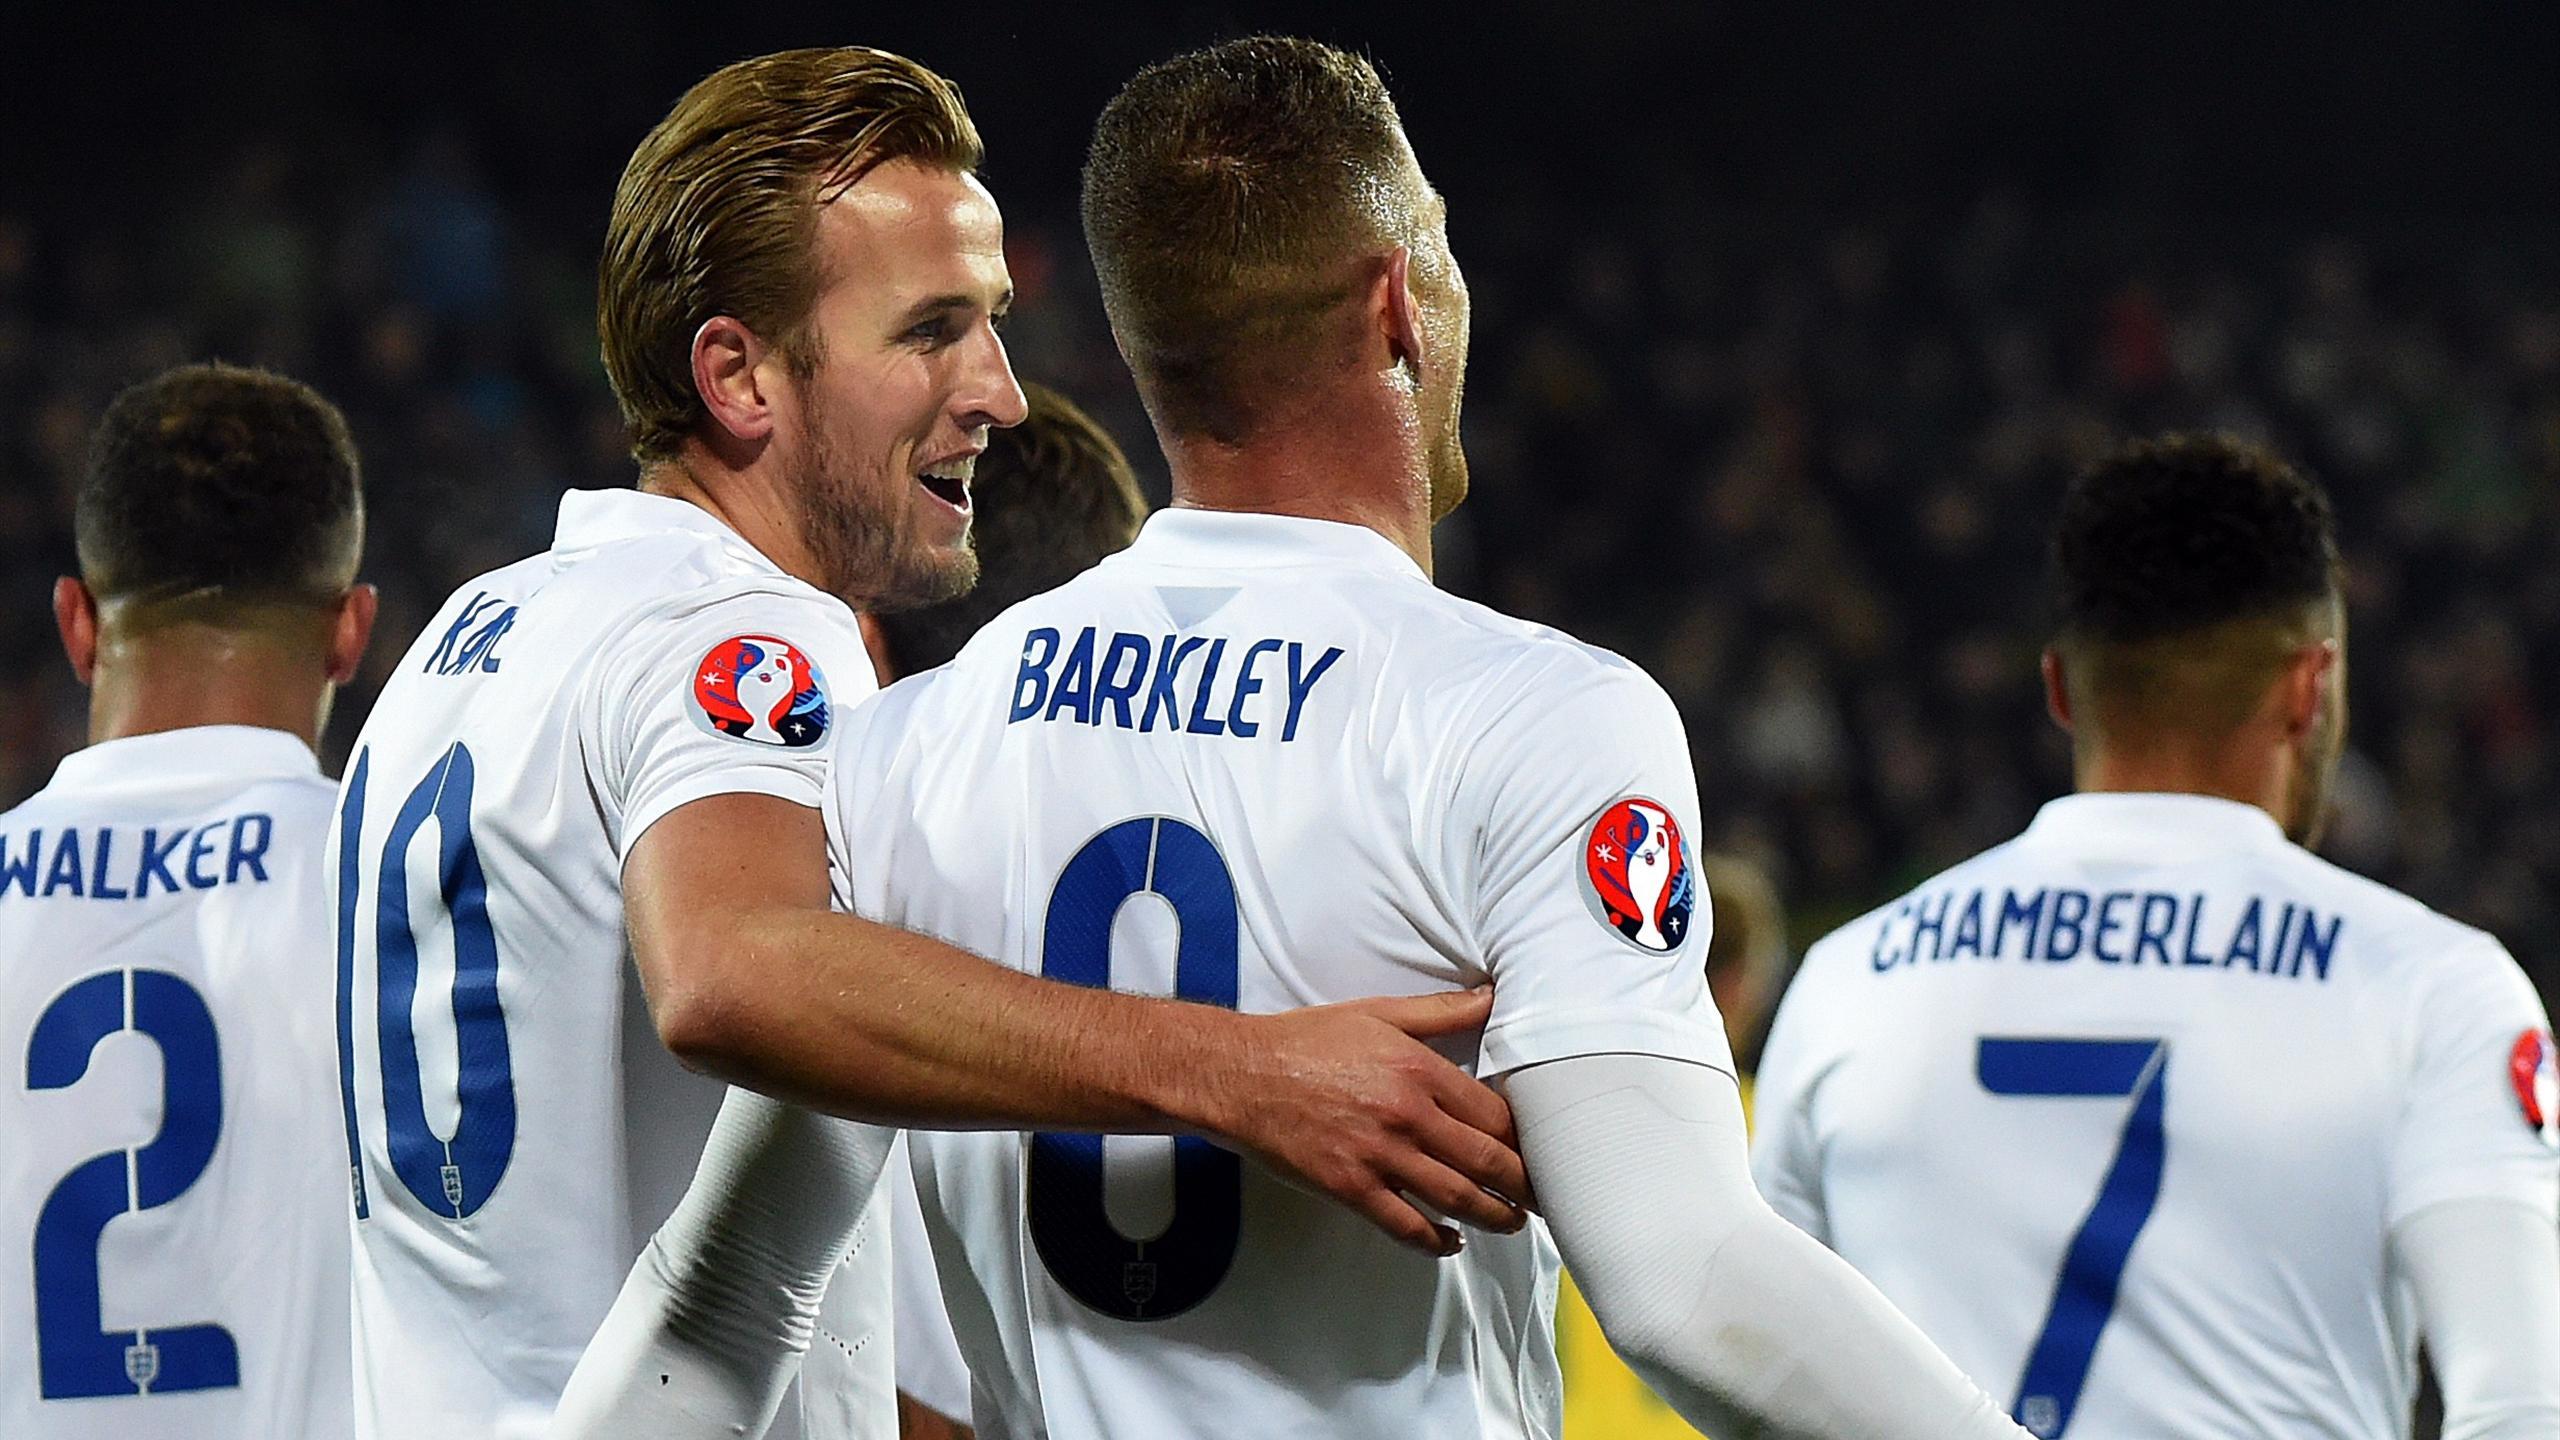 La joie de Harry Kane et de Ross Barkley lors de Lituanie-Angleterre